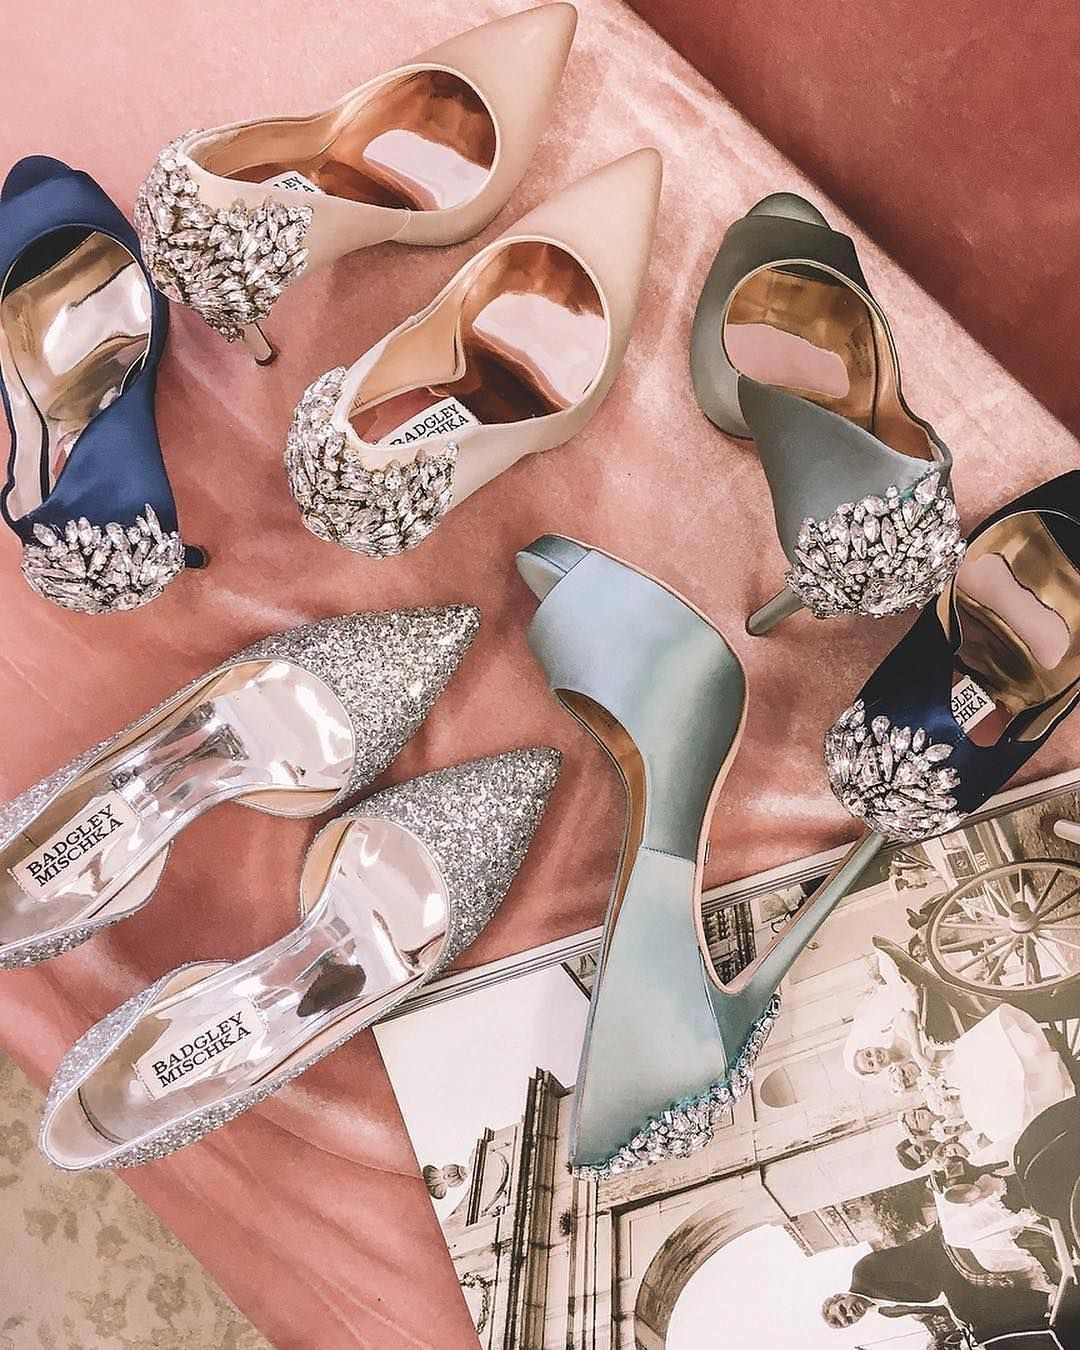 Watch The Best Youtube Videos Online الالوان سنابي تنسيق فستان تصميمي ارواج ميك اب سناب كيك مقطع حامل الس Me Too Shoes Fashion Shoes